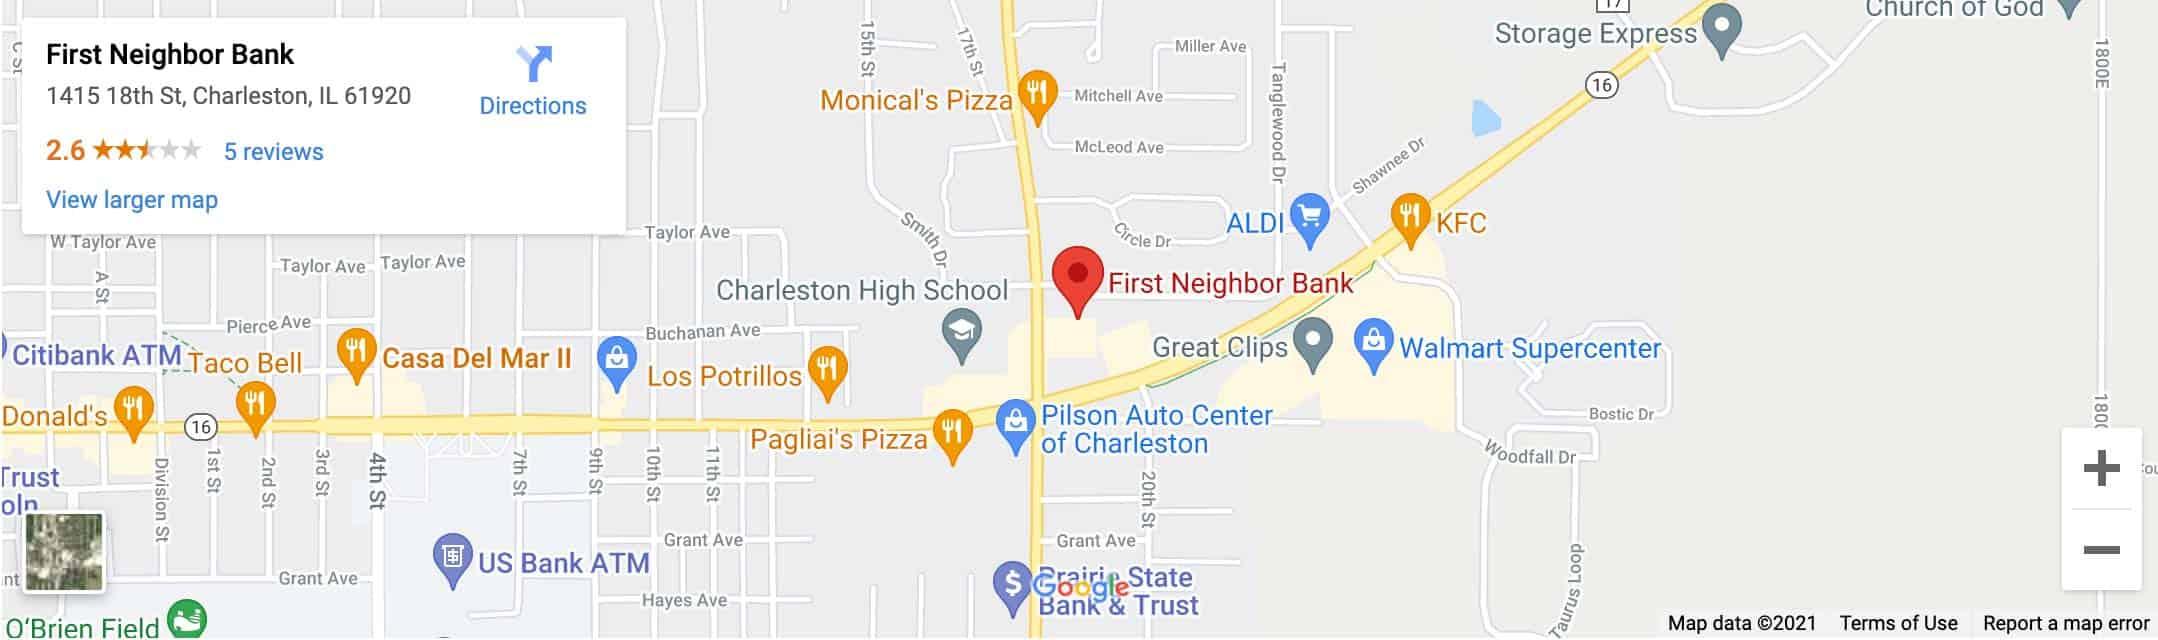 Decorative - First Neighbor Bank Charleston Google Map Image